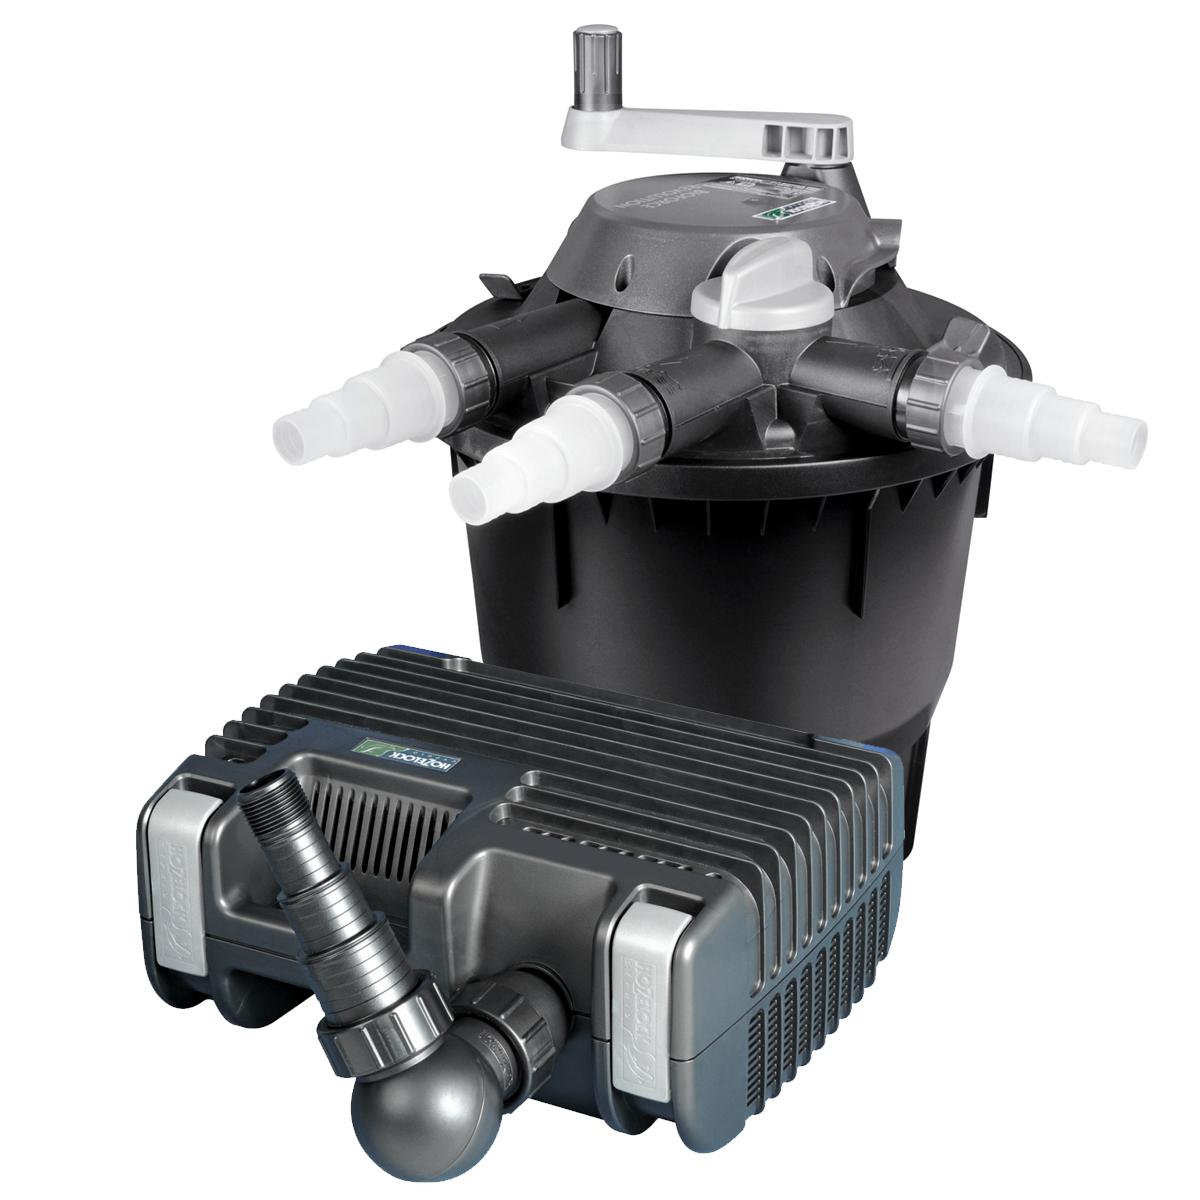 Hozelock bioforce revolution 9000 uv pond pressure filter for Pond pump and filter system